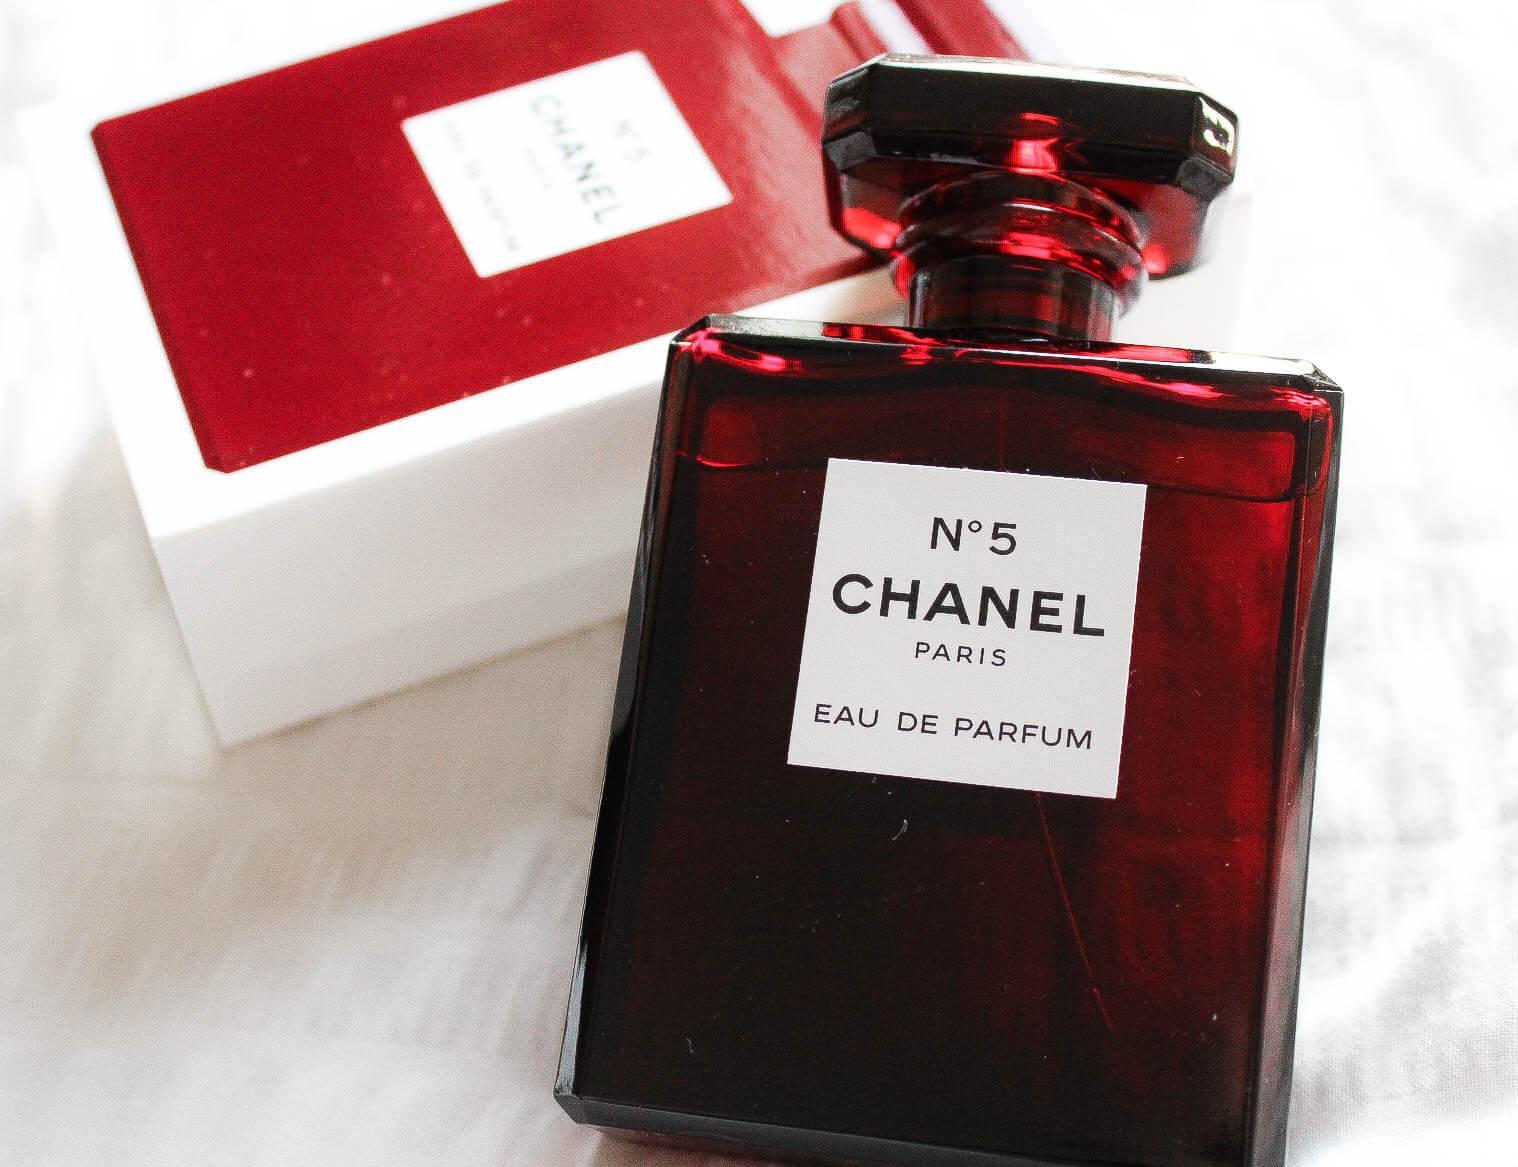 NƯỚC HOA NỮ CHANEL NO 5 PARFUM RED EDITION 100ML - NƯỚC HOA CHANEL